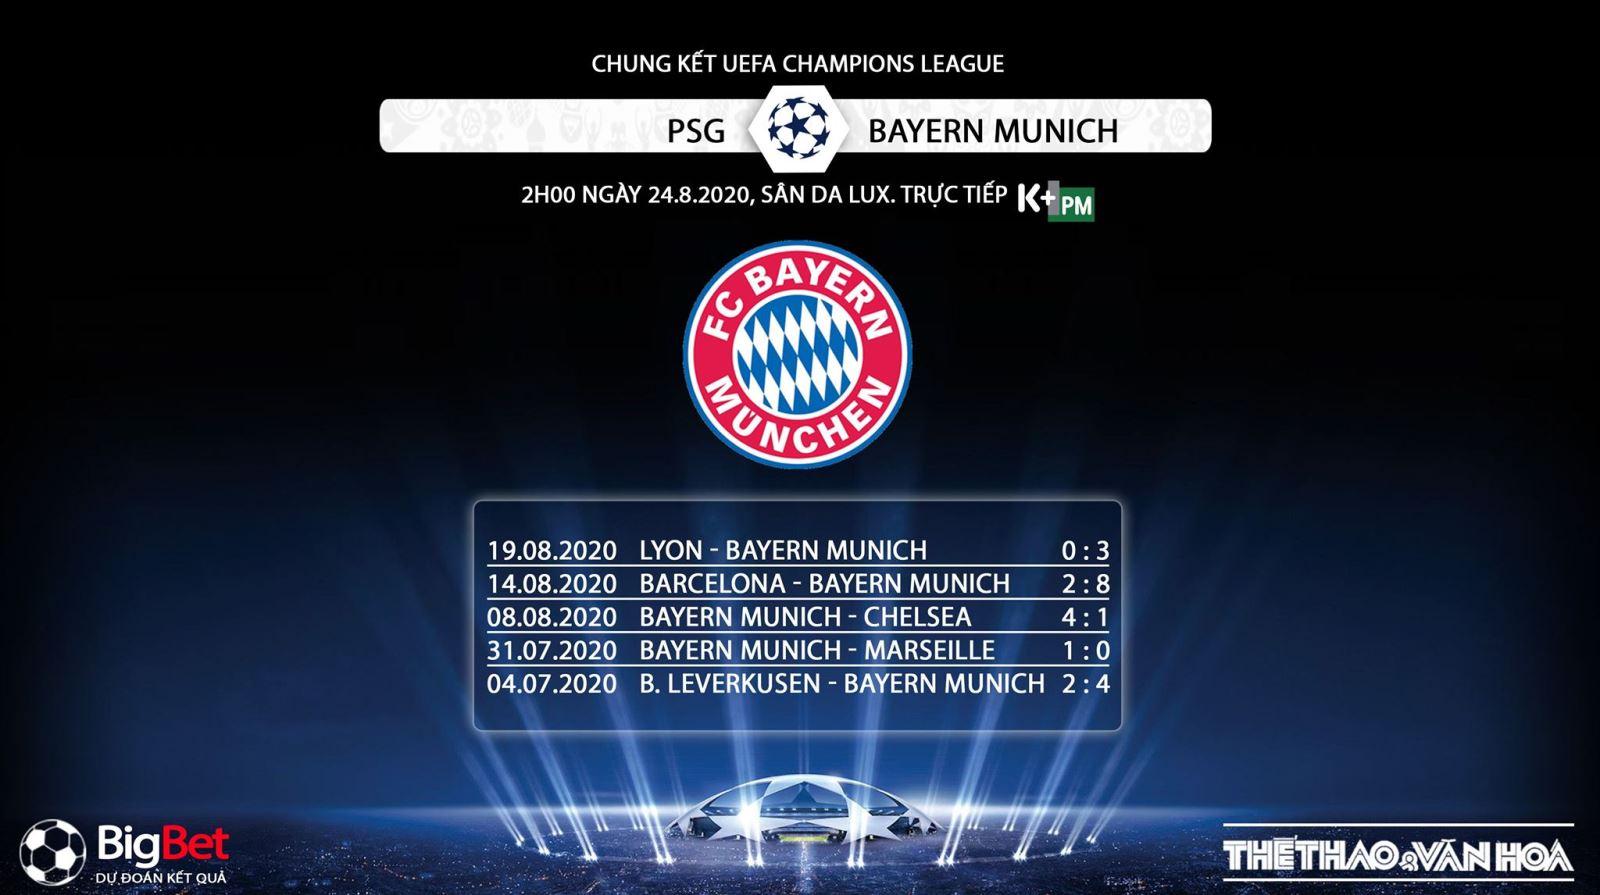 PSG vs Bayern Munich, soi kèo PSG vs Bayern Munich, trực tiếp PSG vs Bayern Munich, nhận định PSG vs Bayern Munich, bóng đá, soi kèo bóng đá, kèo bóng đá